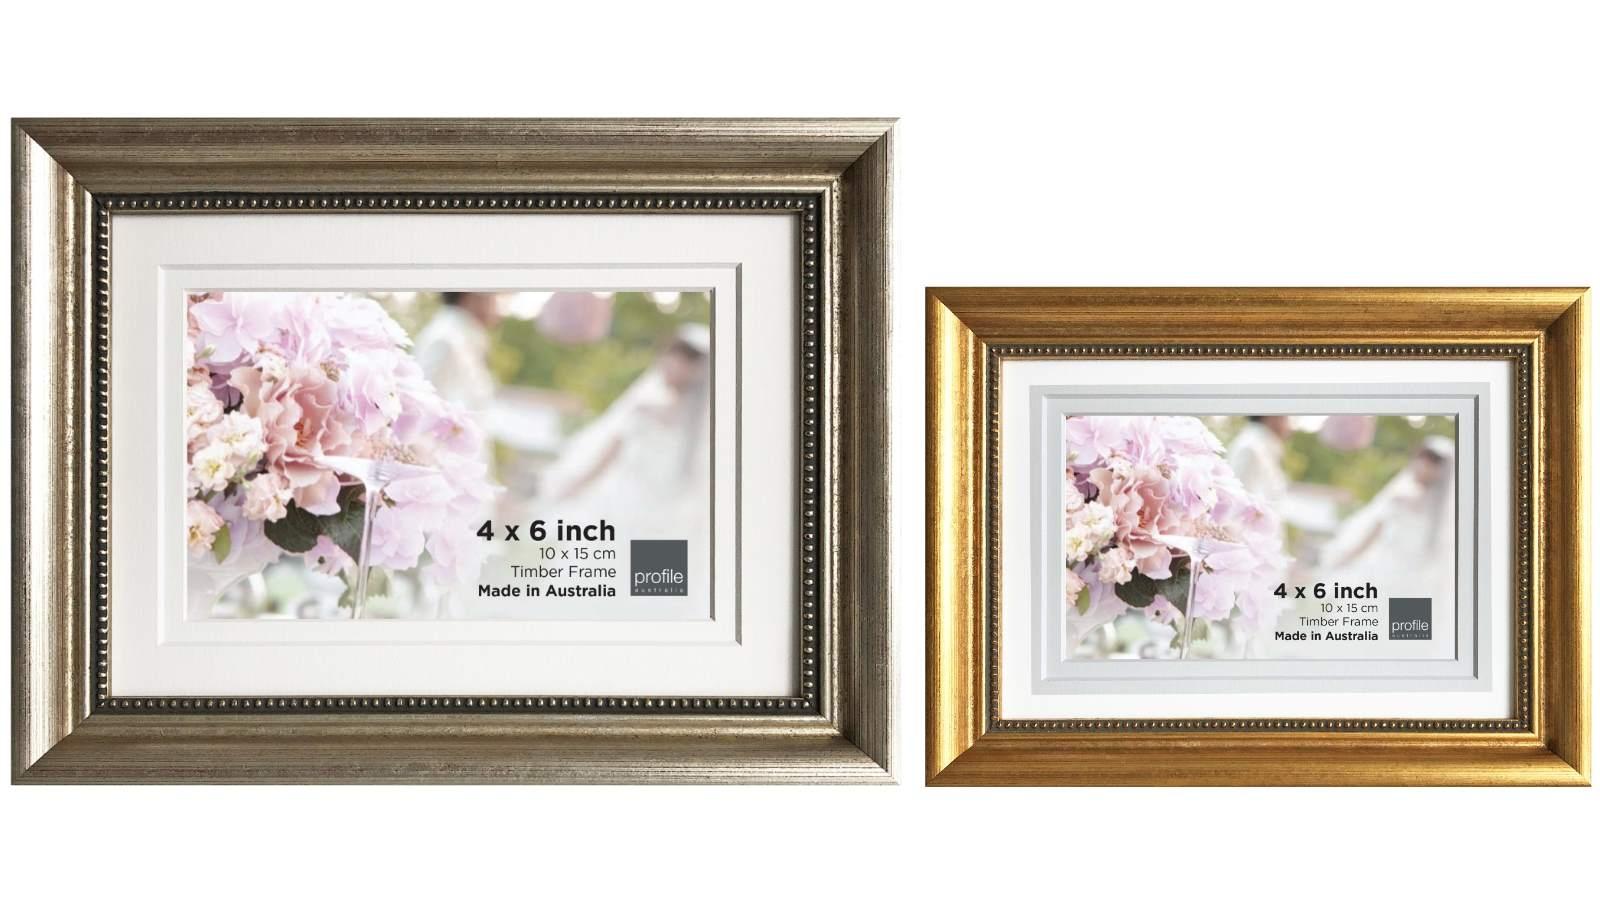 Image of Platinum Majestic 15x20cm/10x15cm Photo Frame